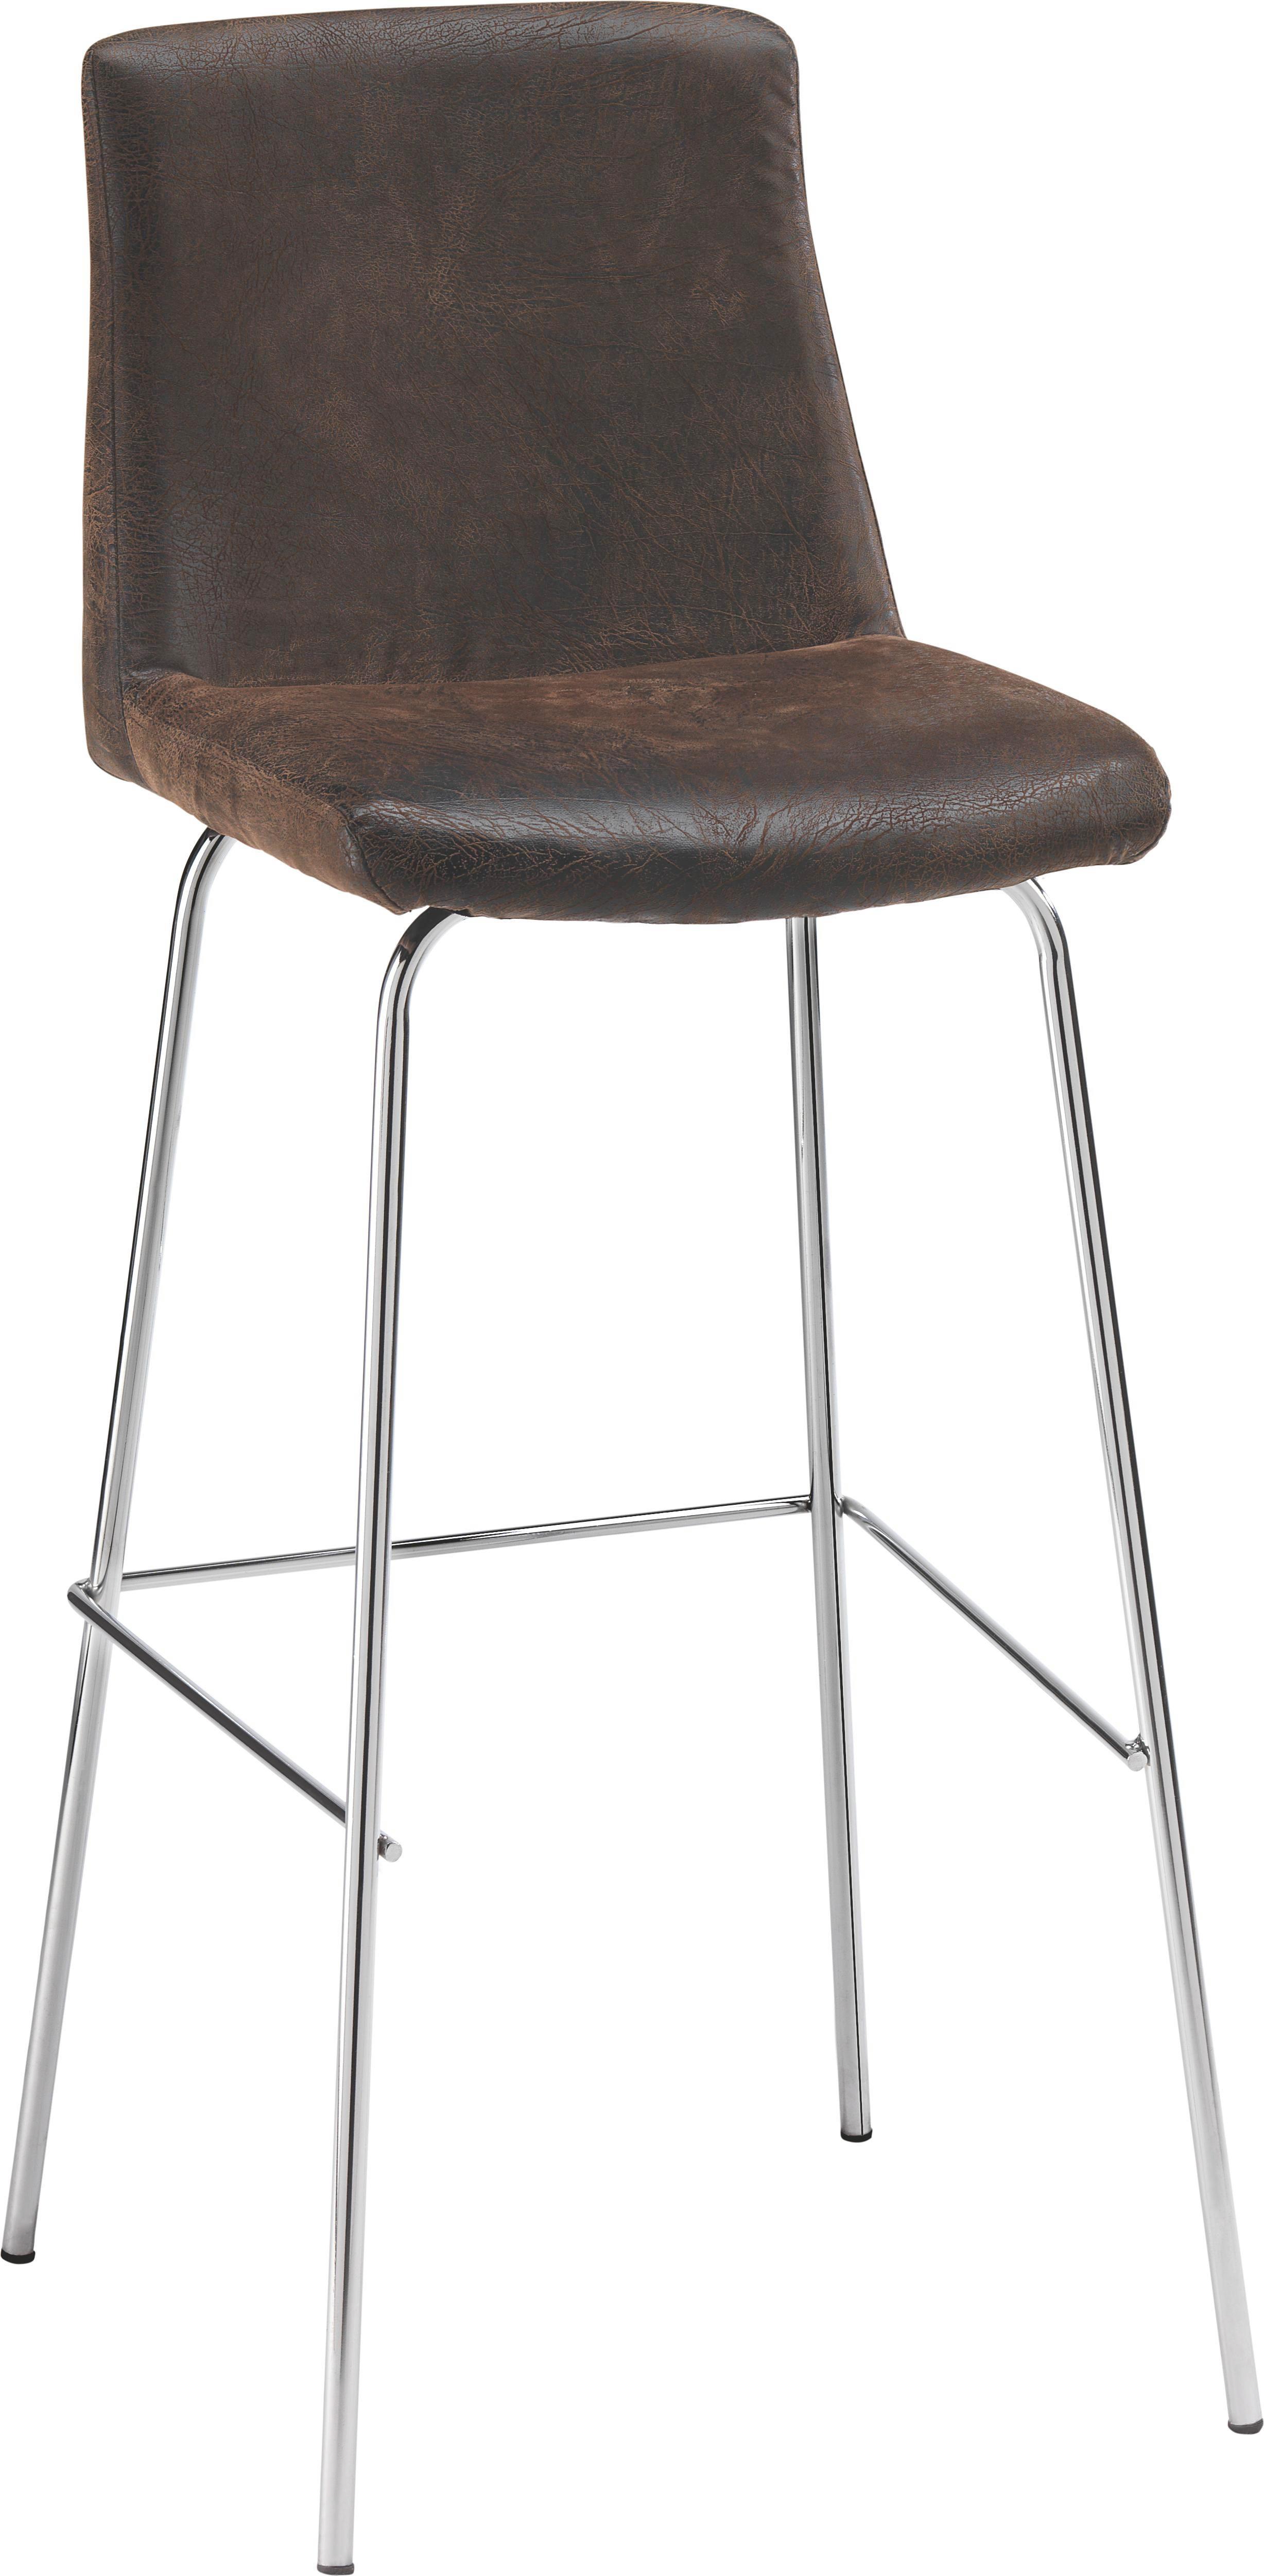 BARHOCKER in Metall, Textil Braun, Chromfarben - Chromfarben/Braun, Design, Textil/Metall (40/108/44cm) - CARRYHOME